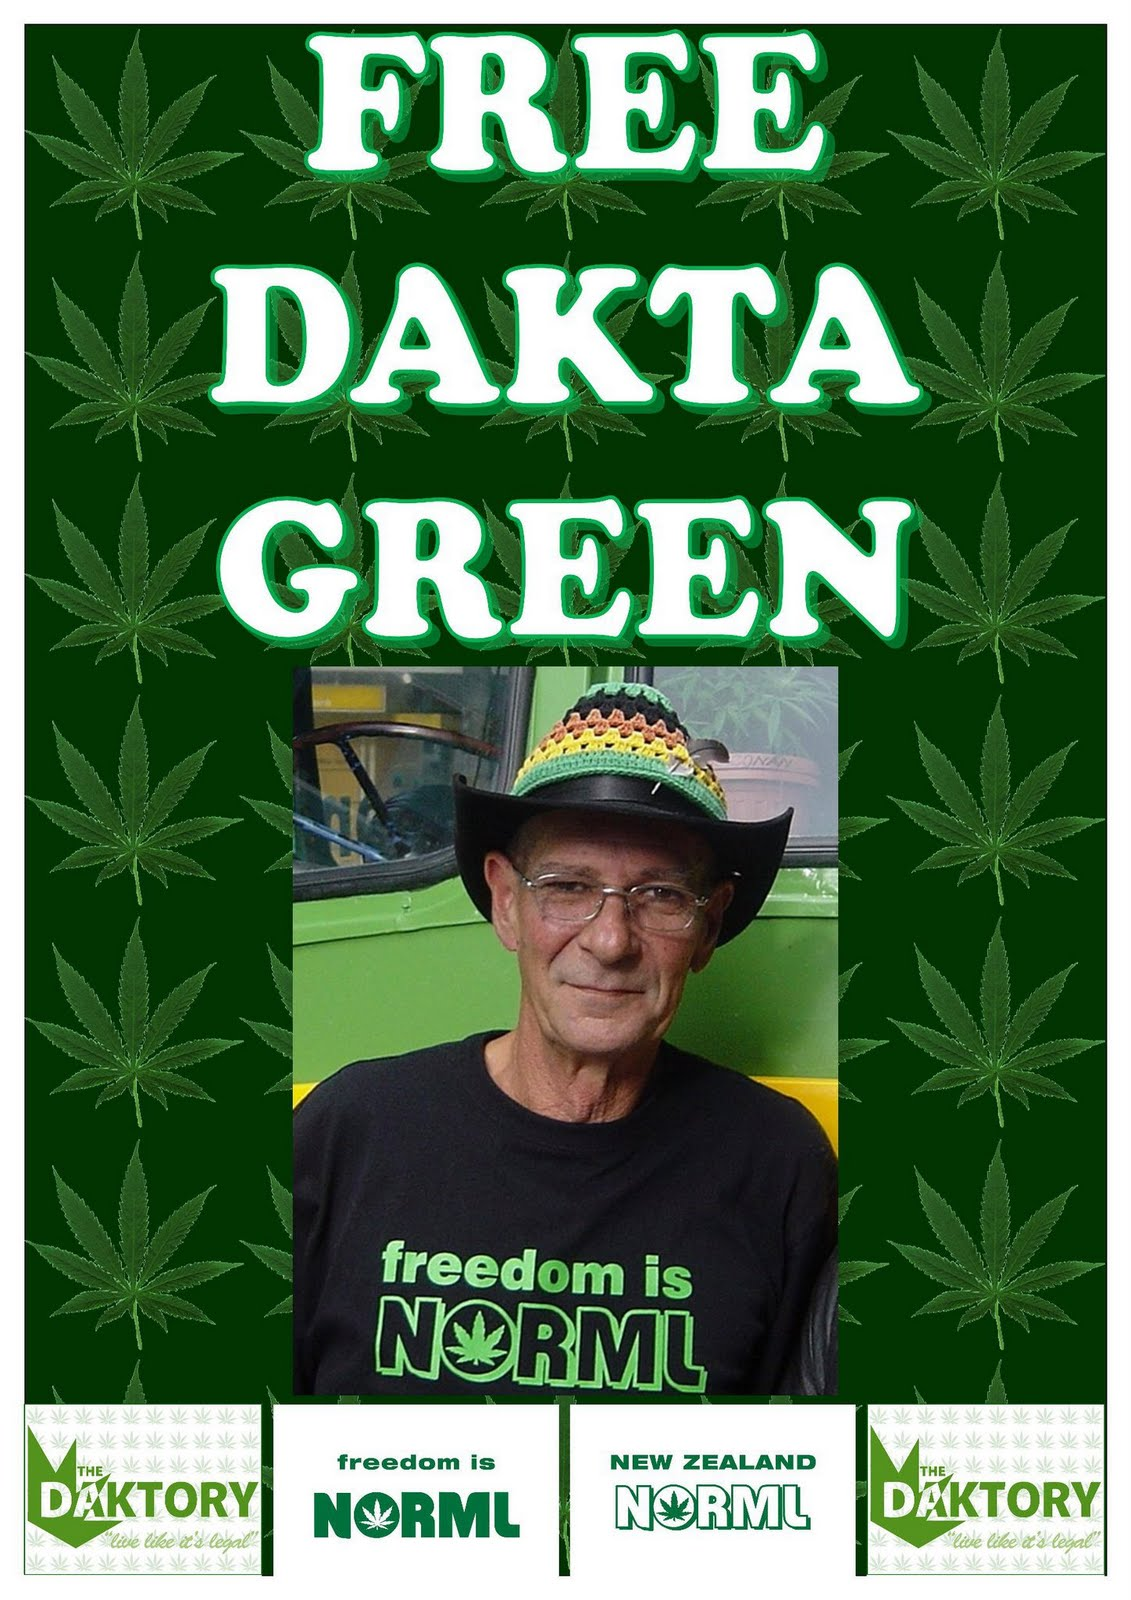 Free Dakta Green